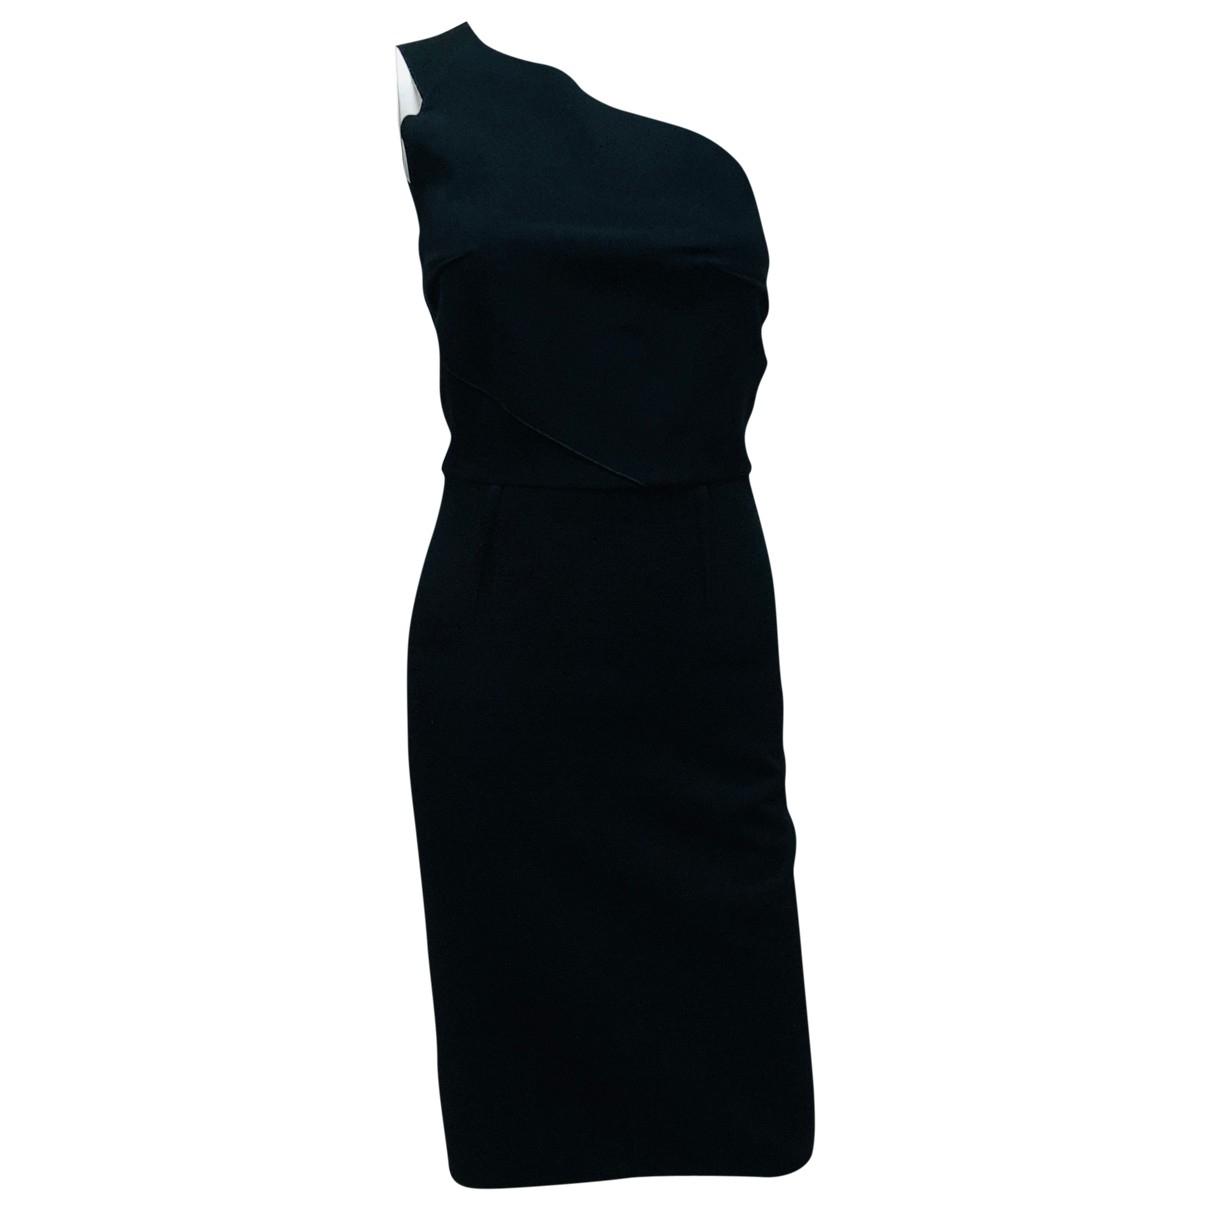 Roland Mouret \N Black Cotton dress for Women 36 FR